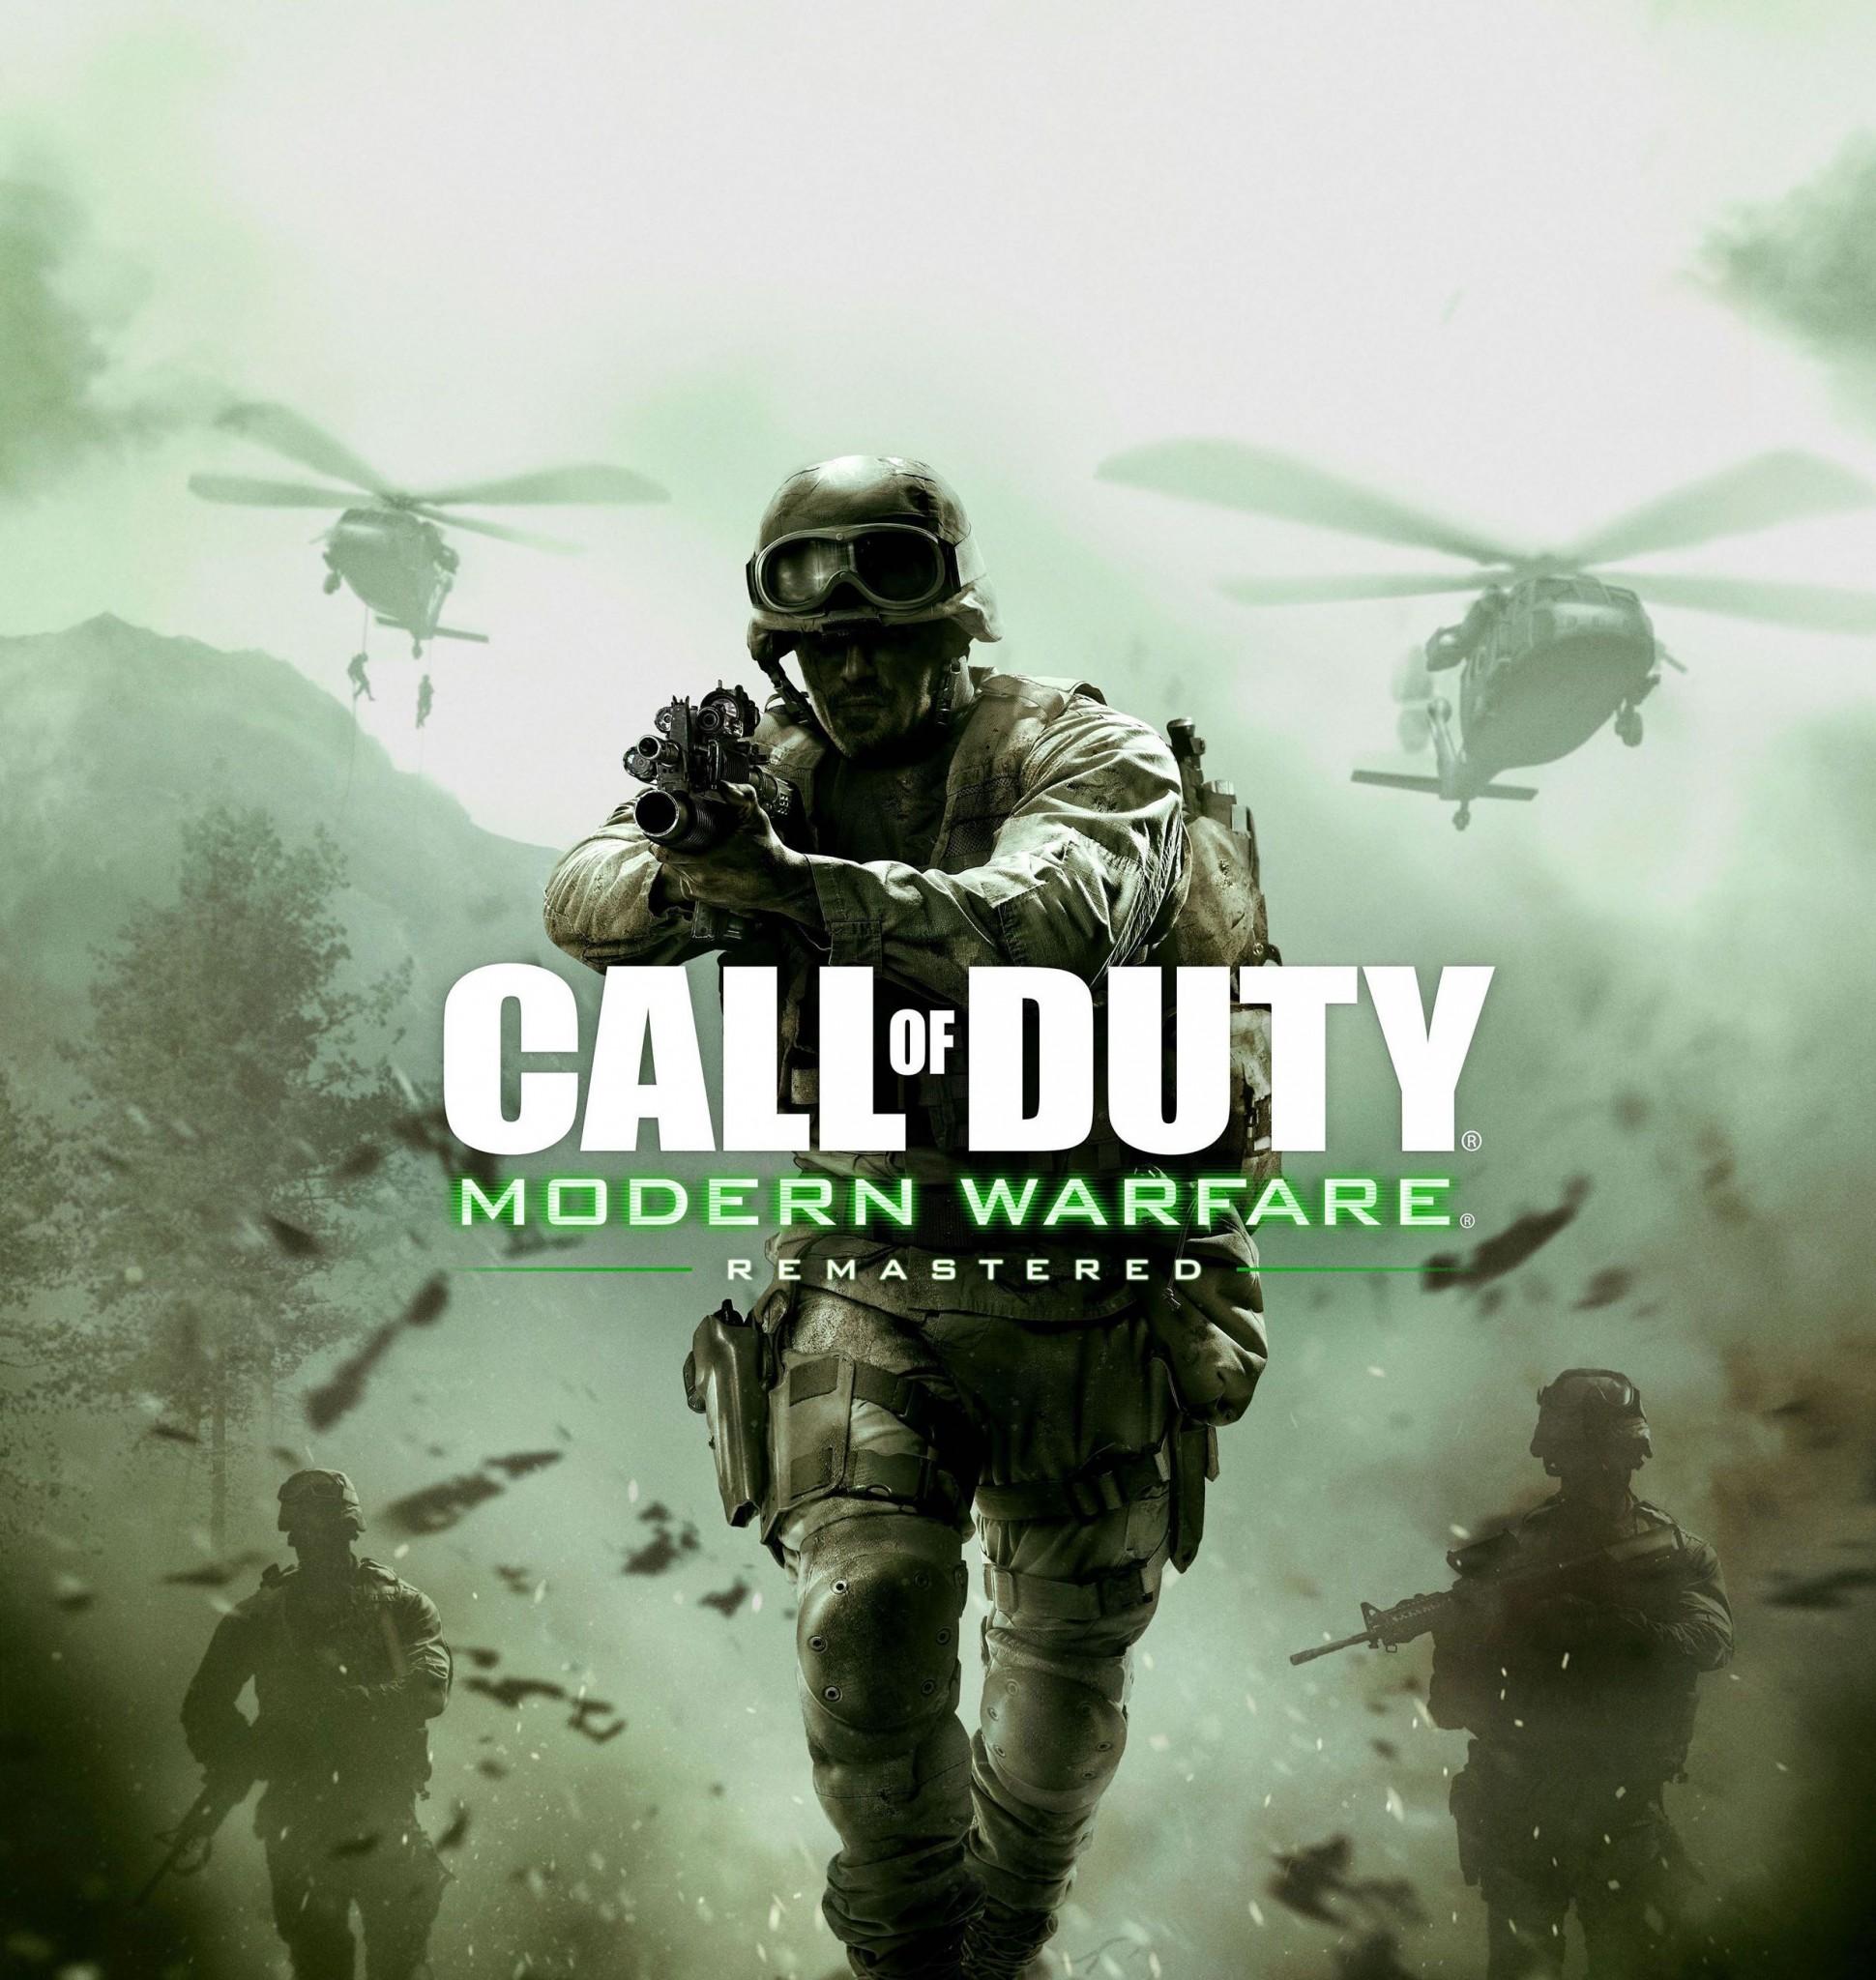 Studio BEENOX et Call of Duty, édition remastérisée